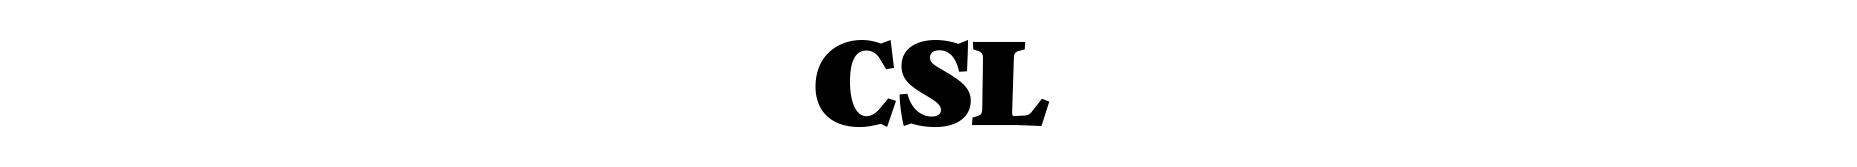 CSL_tombstone.jpg